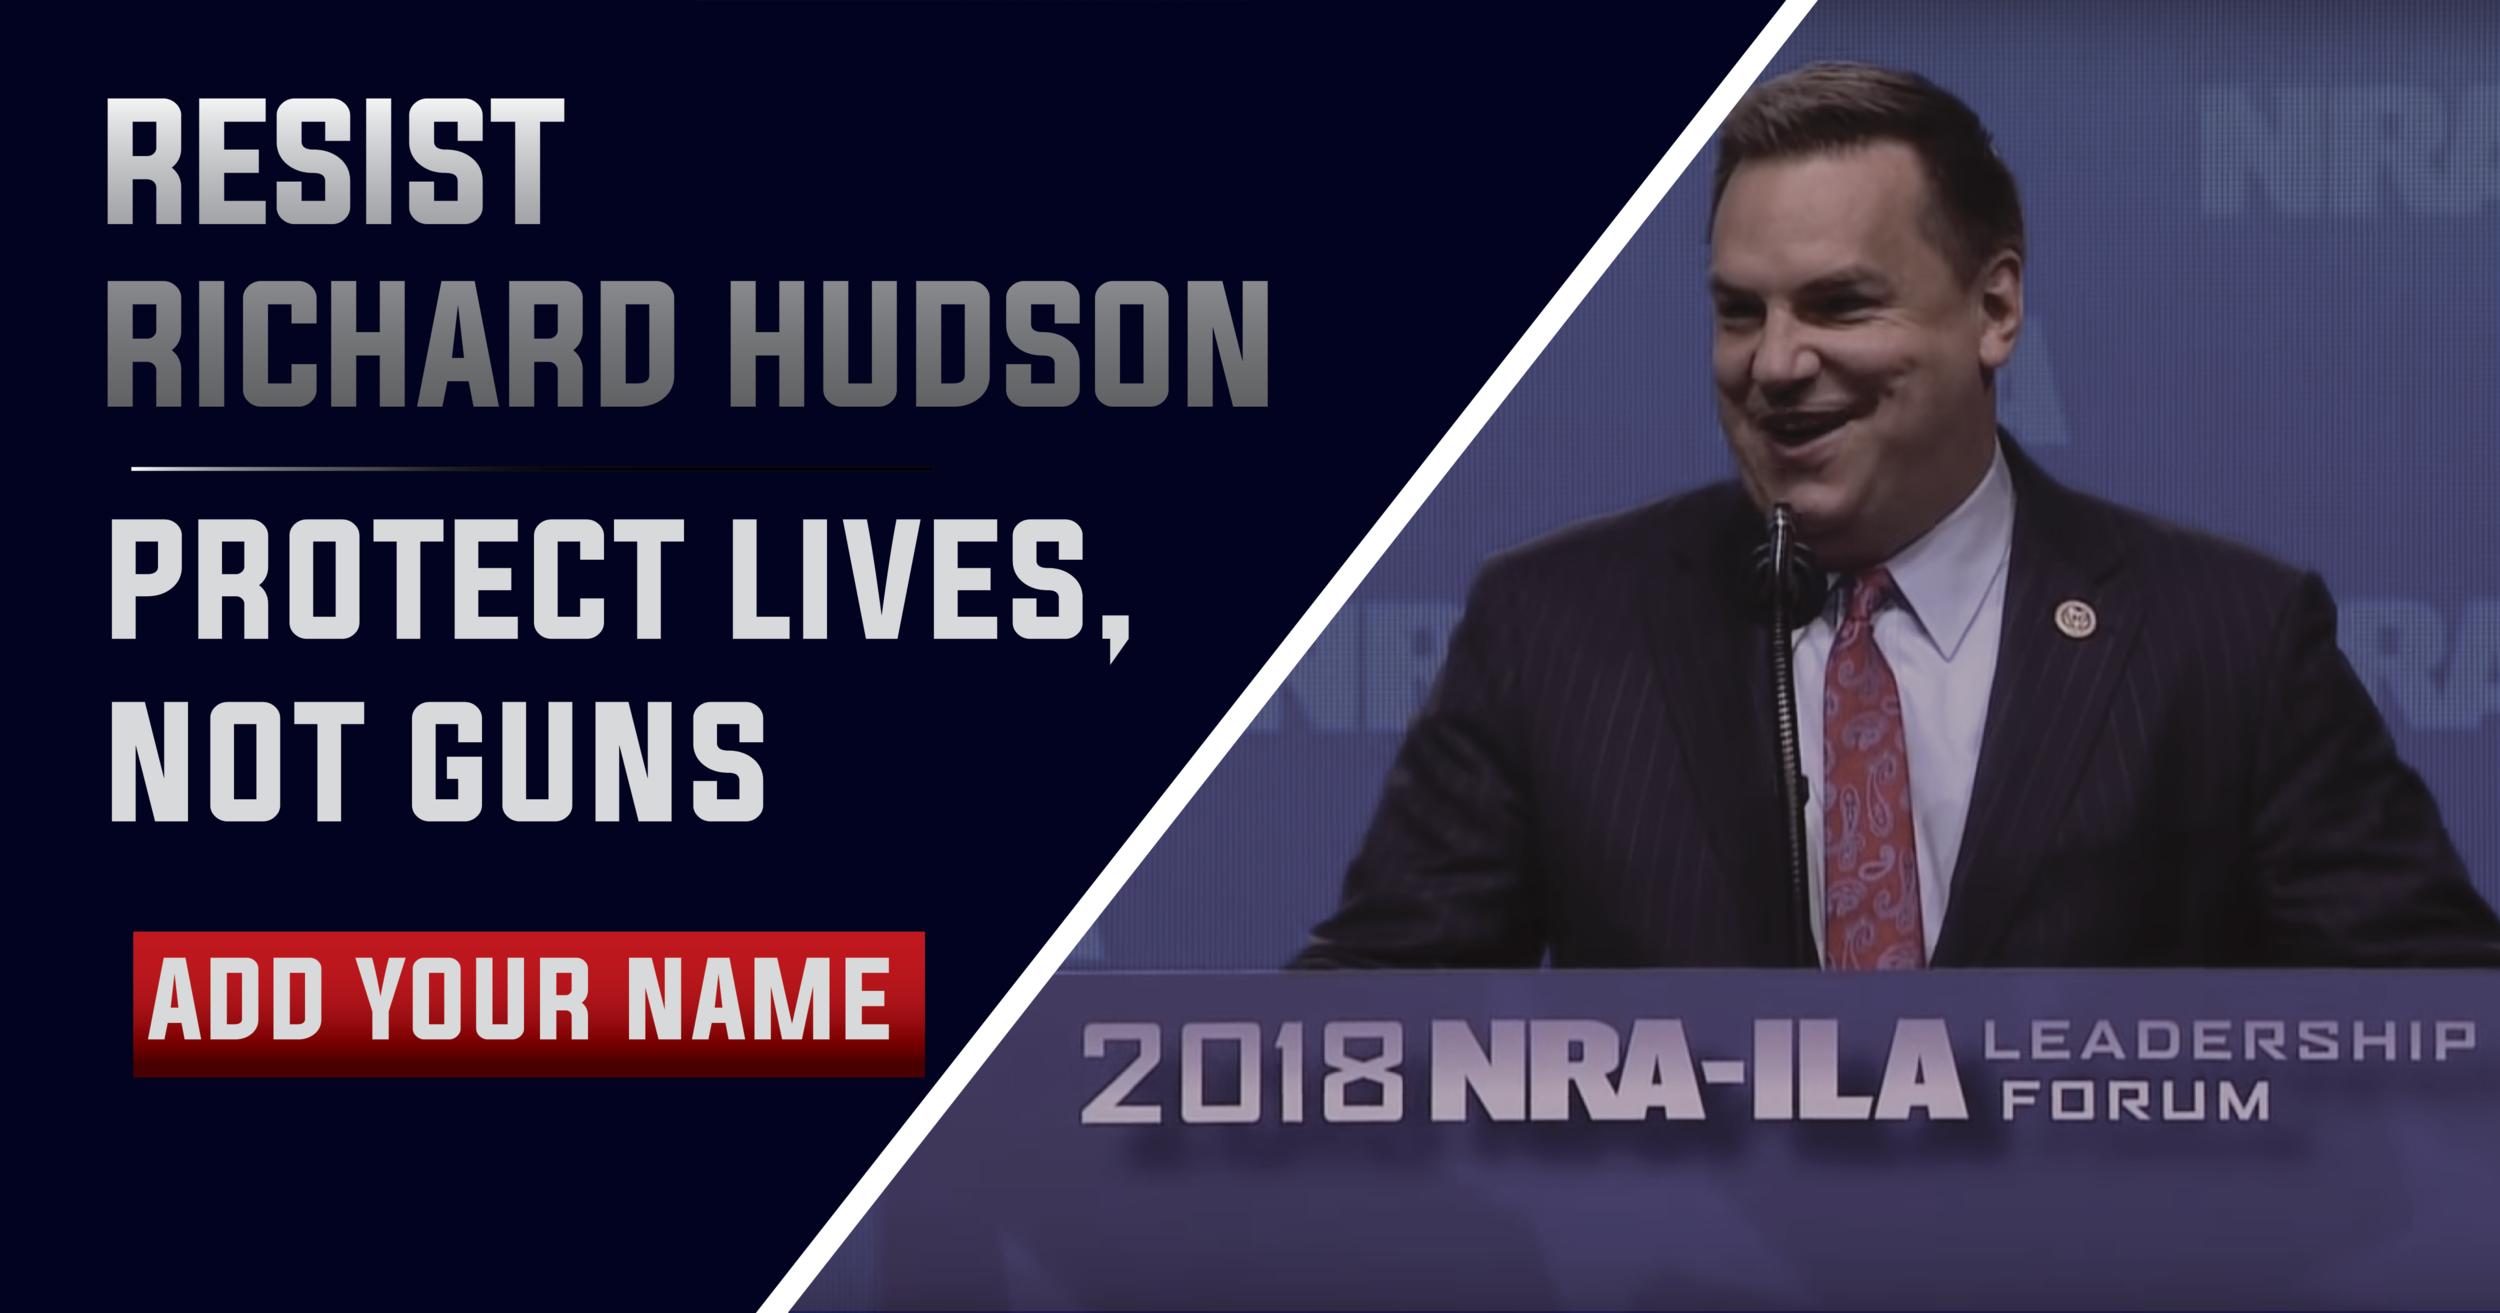 02.12.2019- Resist Richard Hudson-01.png